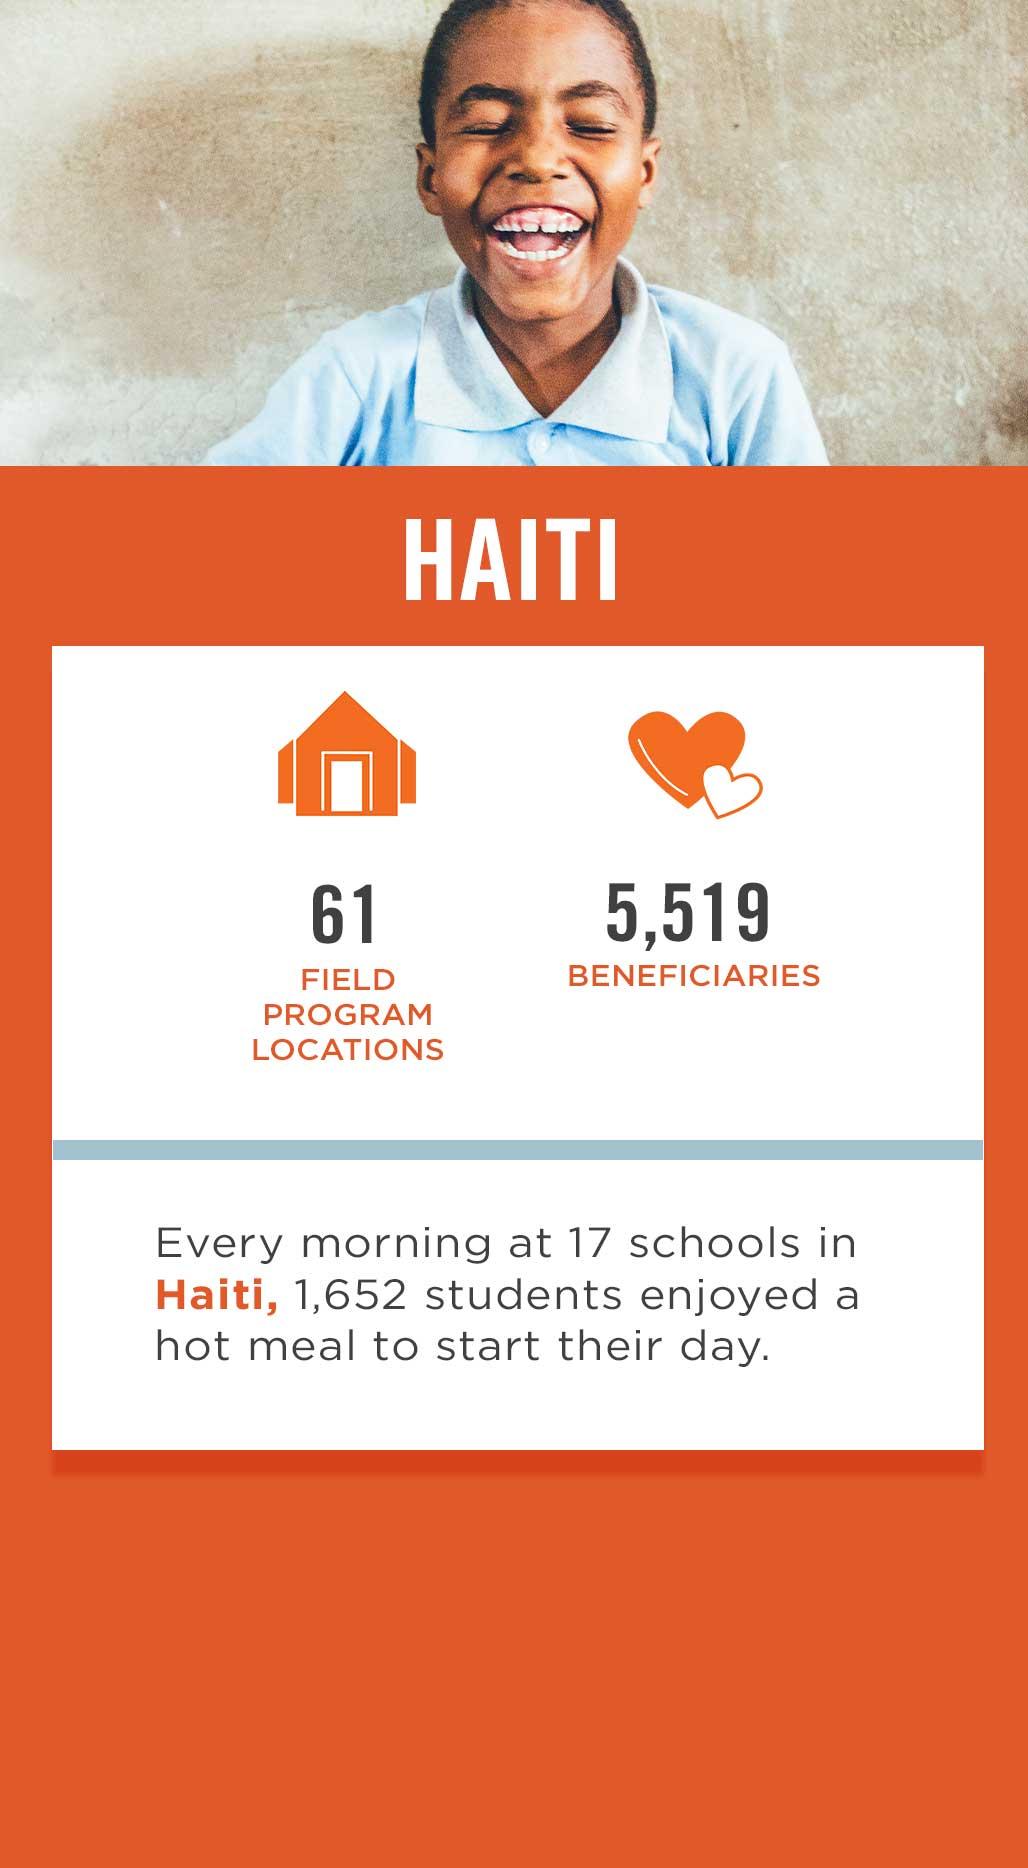 Haiti School Feeding Program